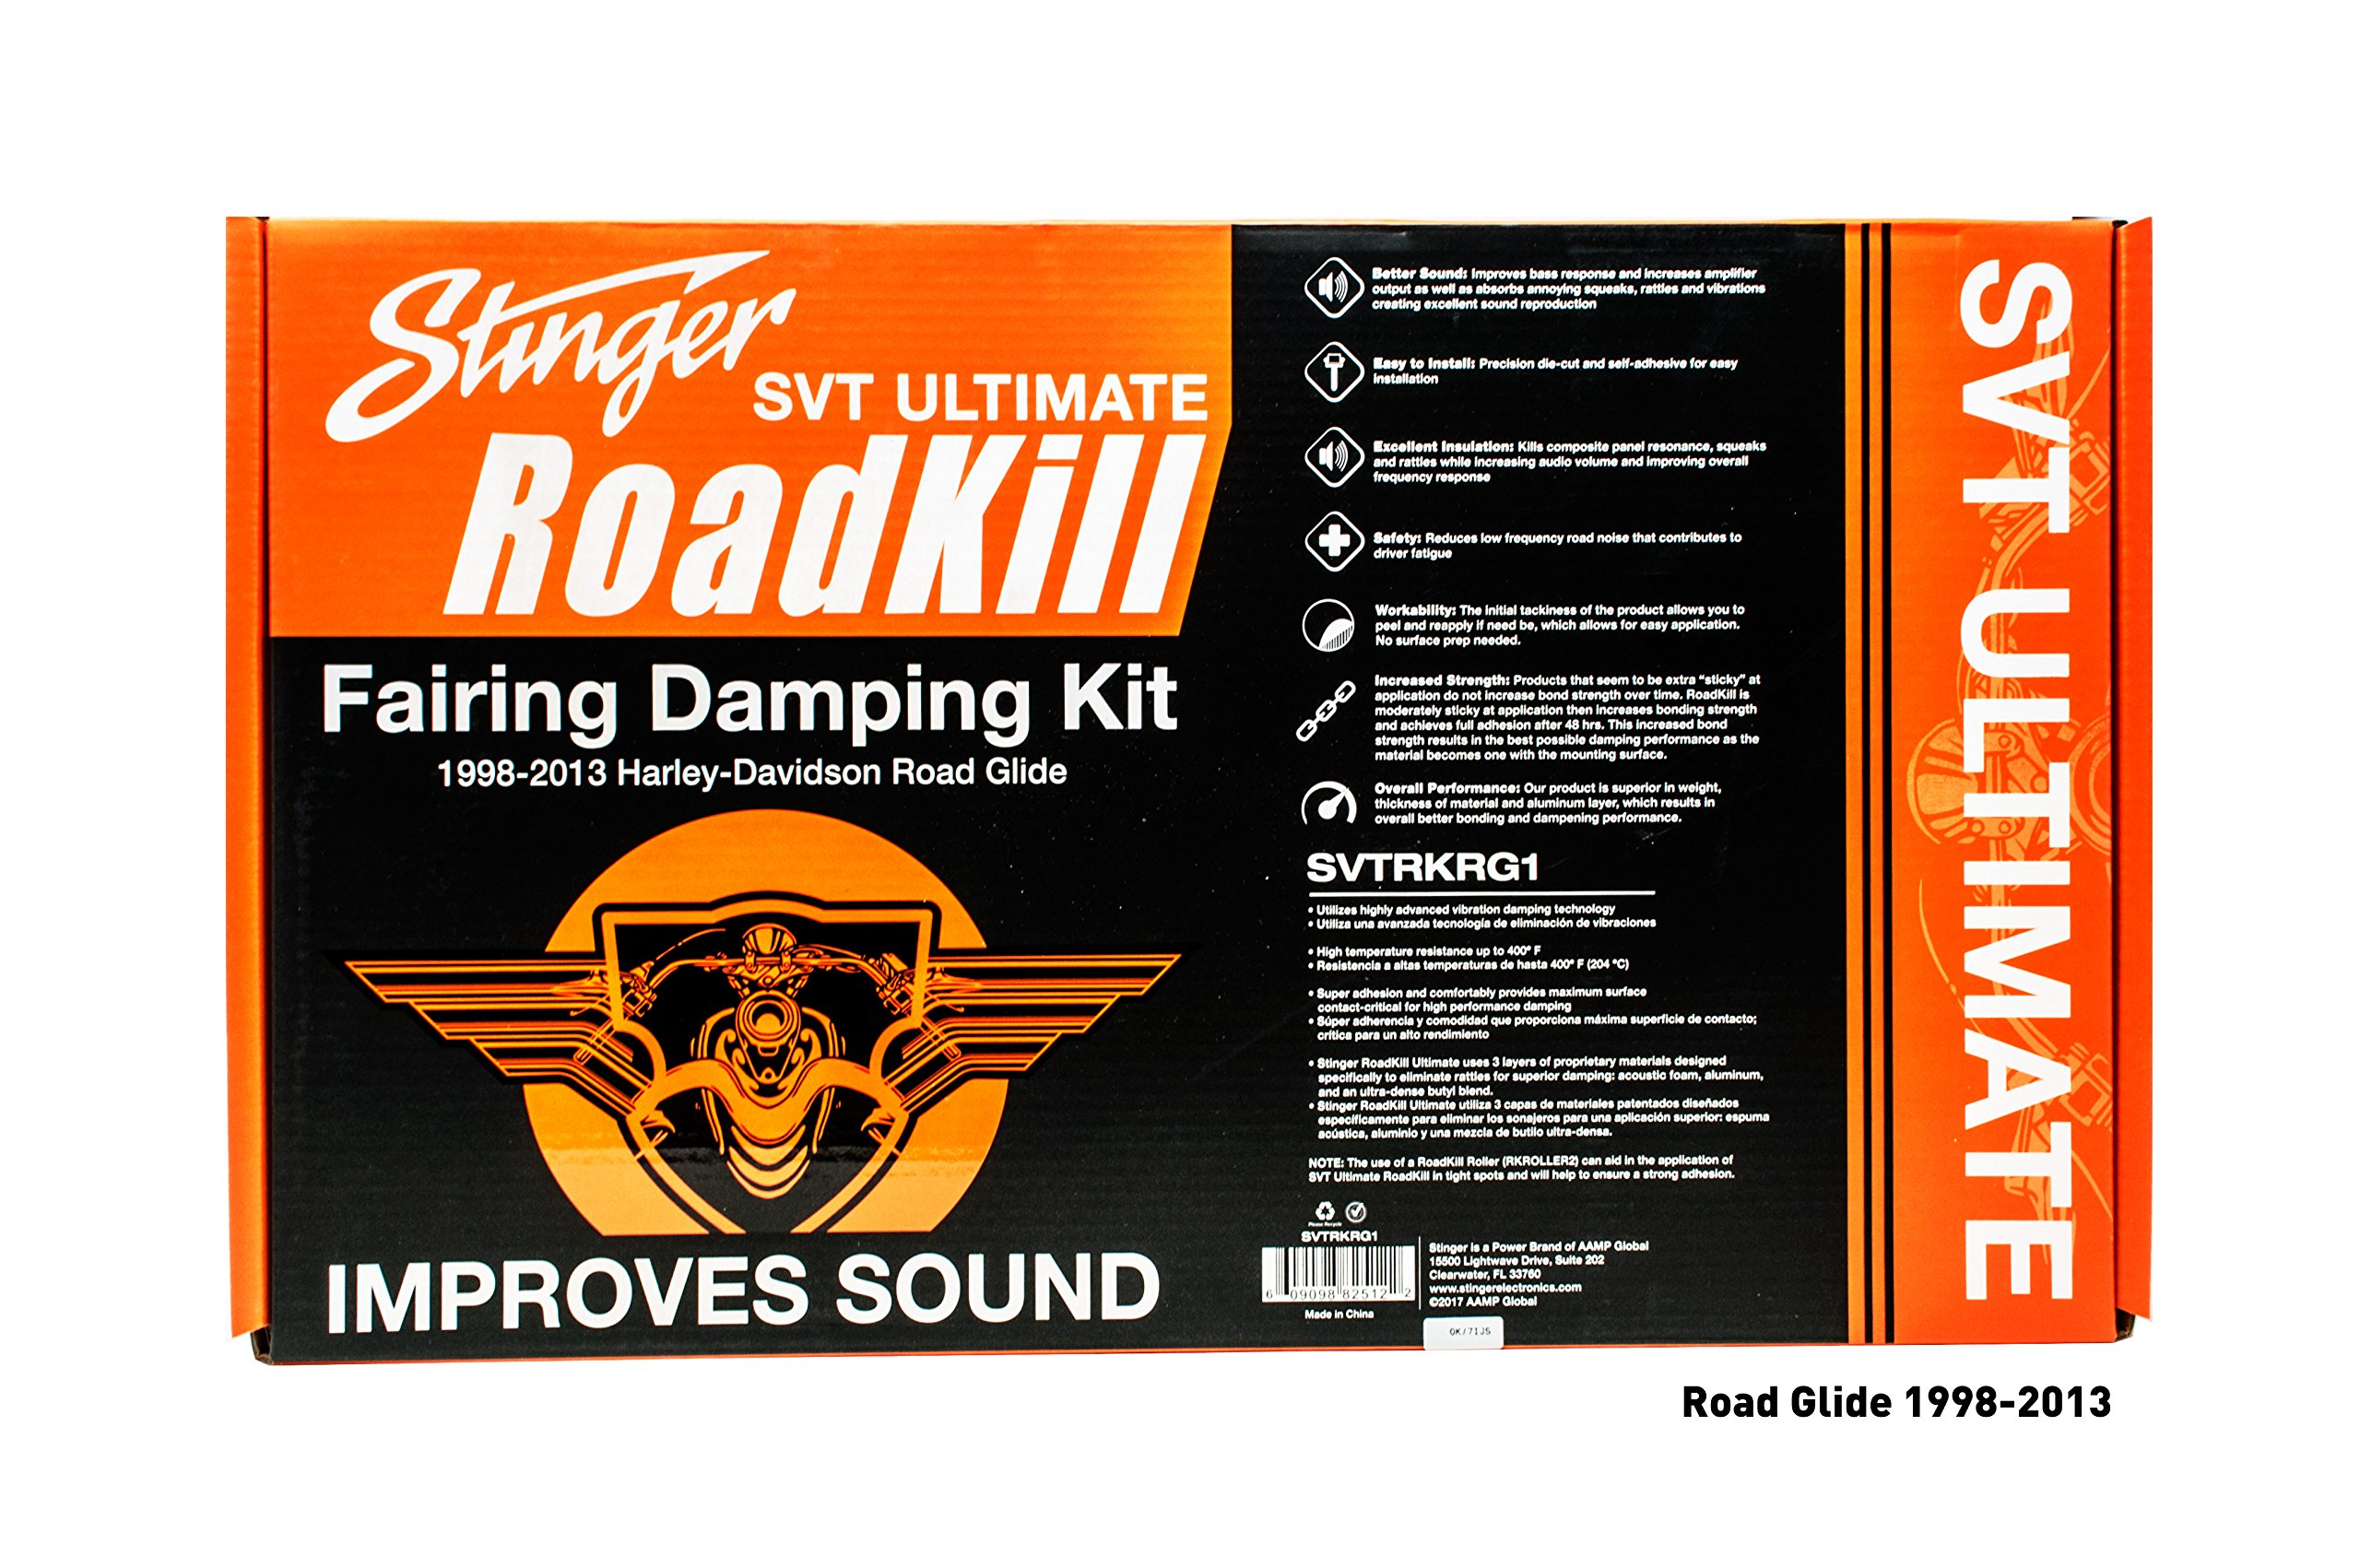 Stinger SVTRKRG1 - Harley Davidson Sound Damping Kit - Pre-Cut Sheets for Perfect Fitment. Fits 1998-2013 Road Glide